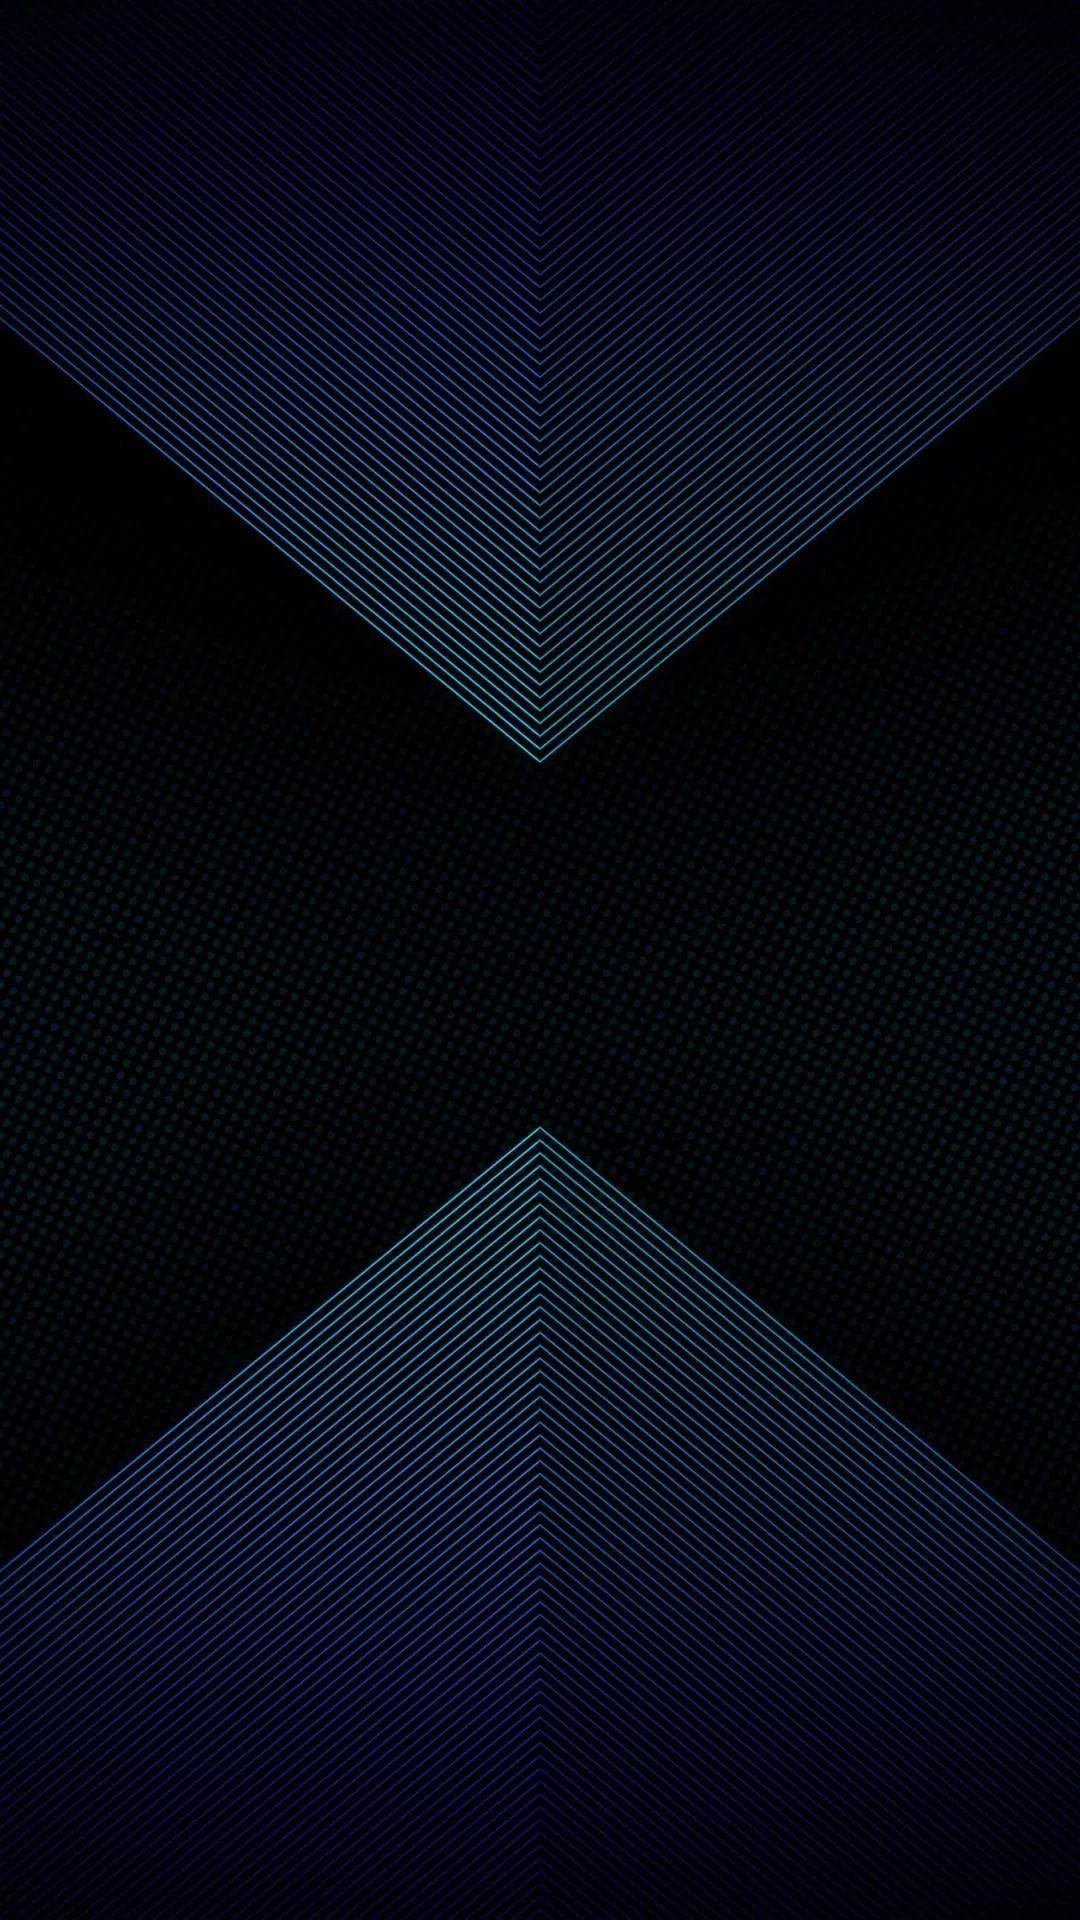 Dark Blue iPhone 6 wallpaper